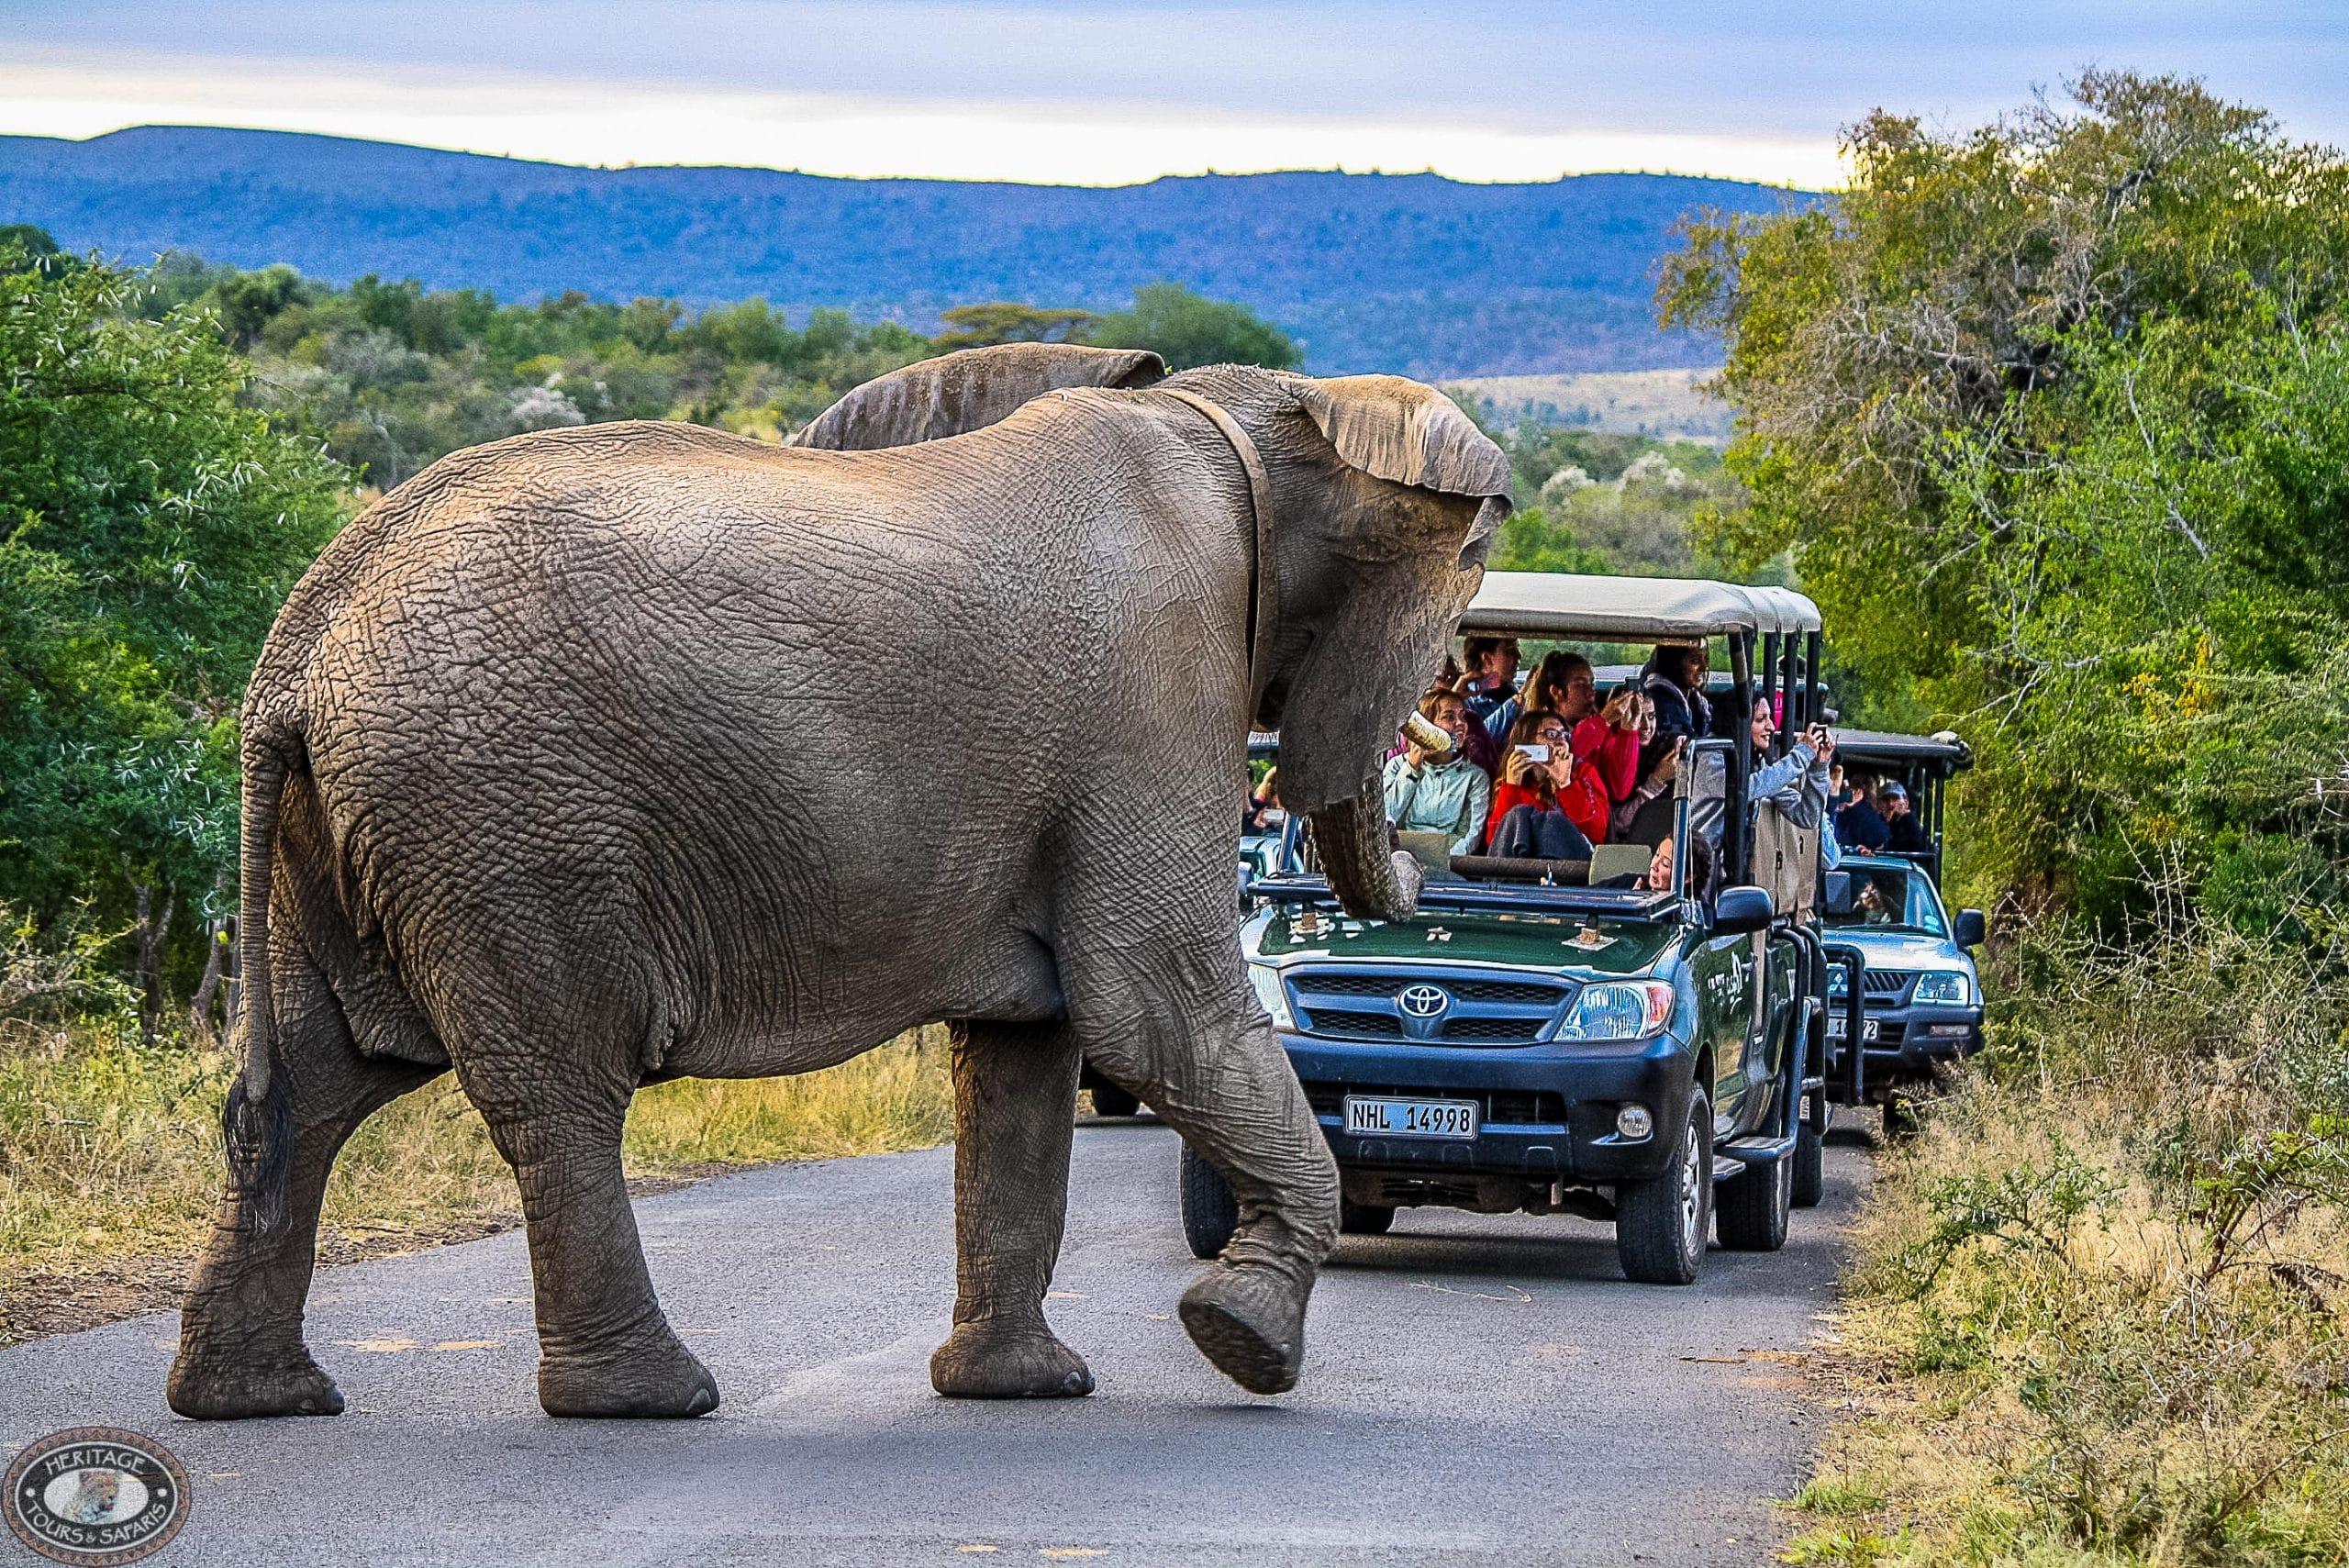 full day safari hluhluwe-imfolozi park safari